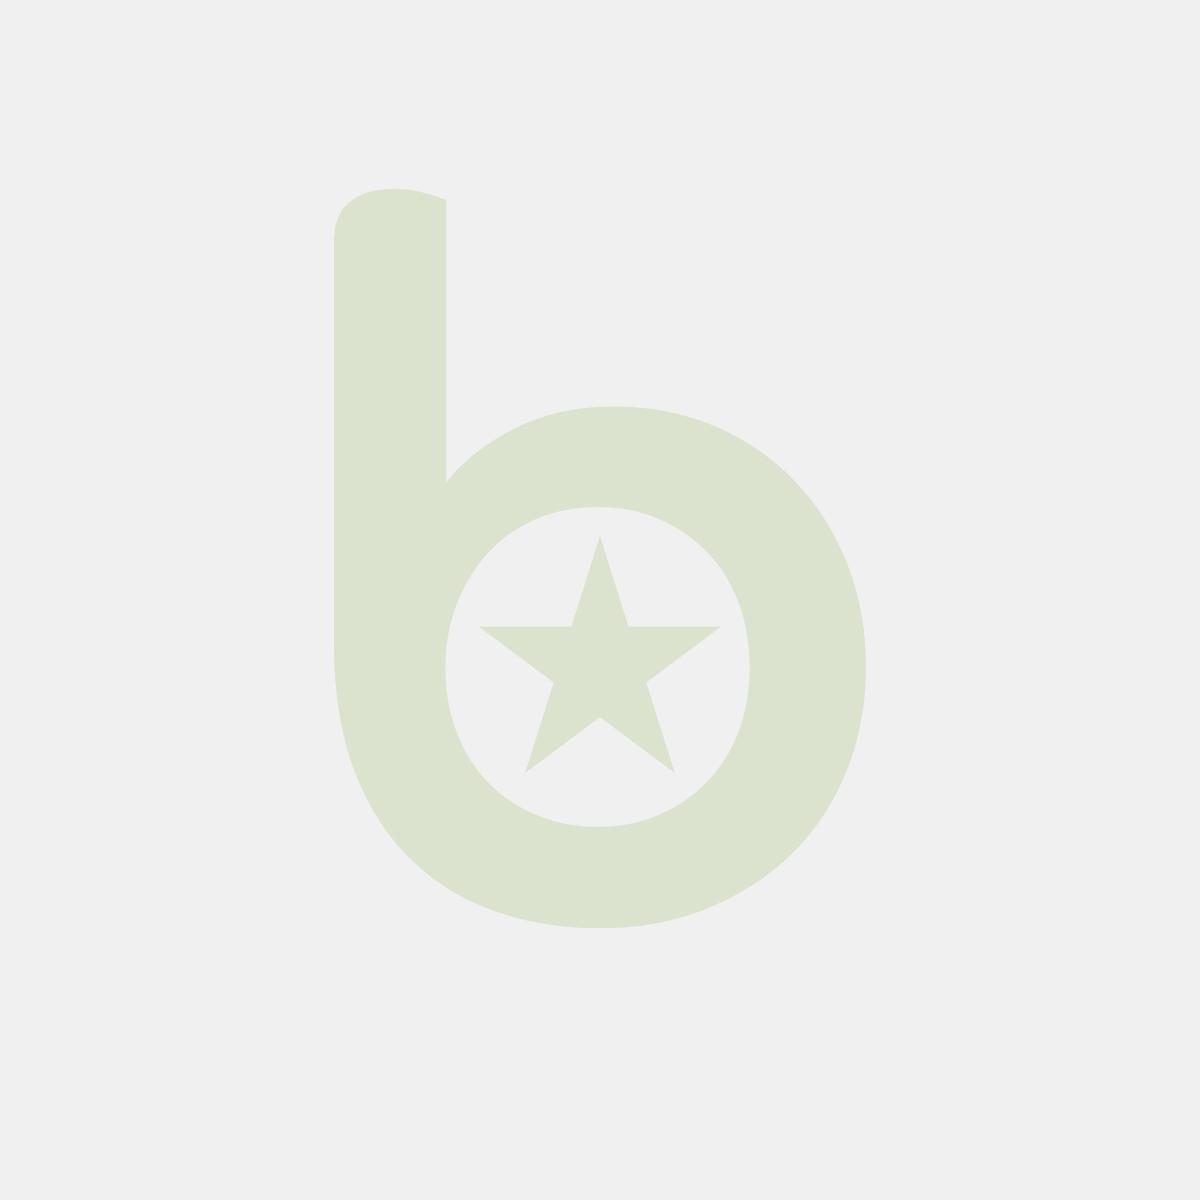 Pióro kulkowe SCHNEIDER Breeze NEON, M, różowe/czarne + 5 x kartridż, blister